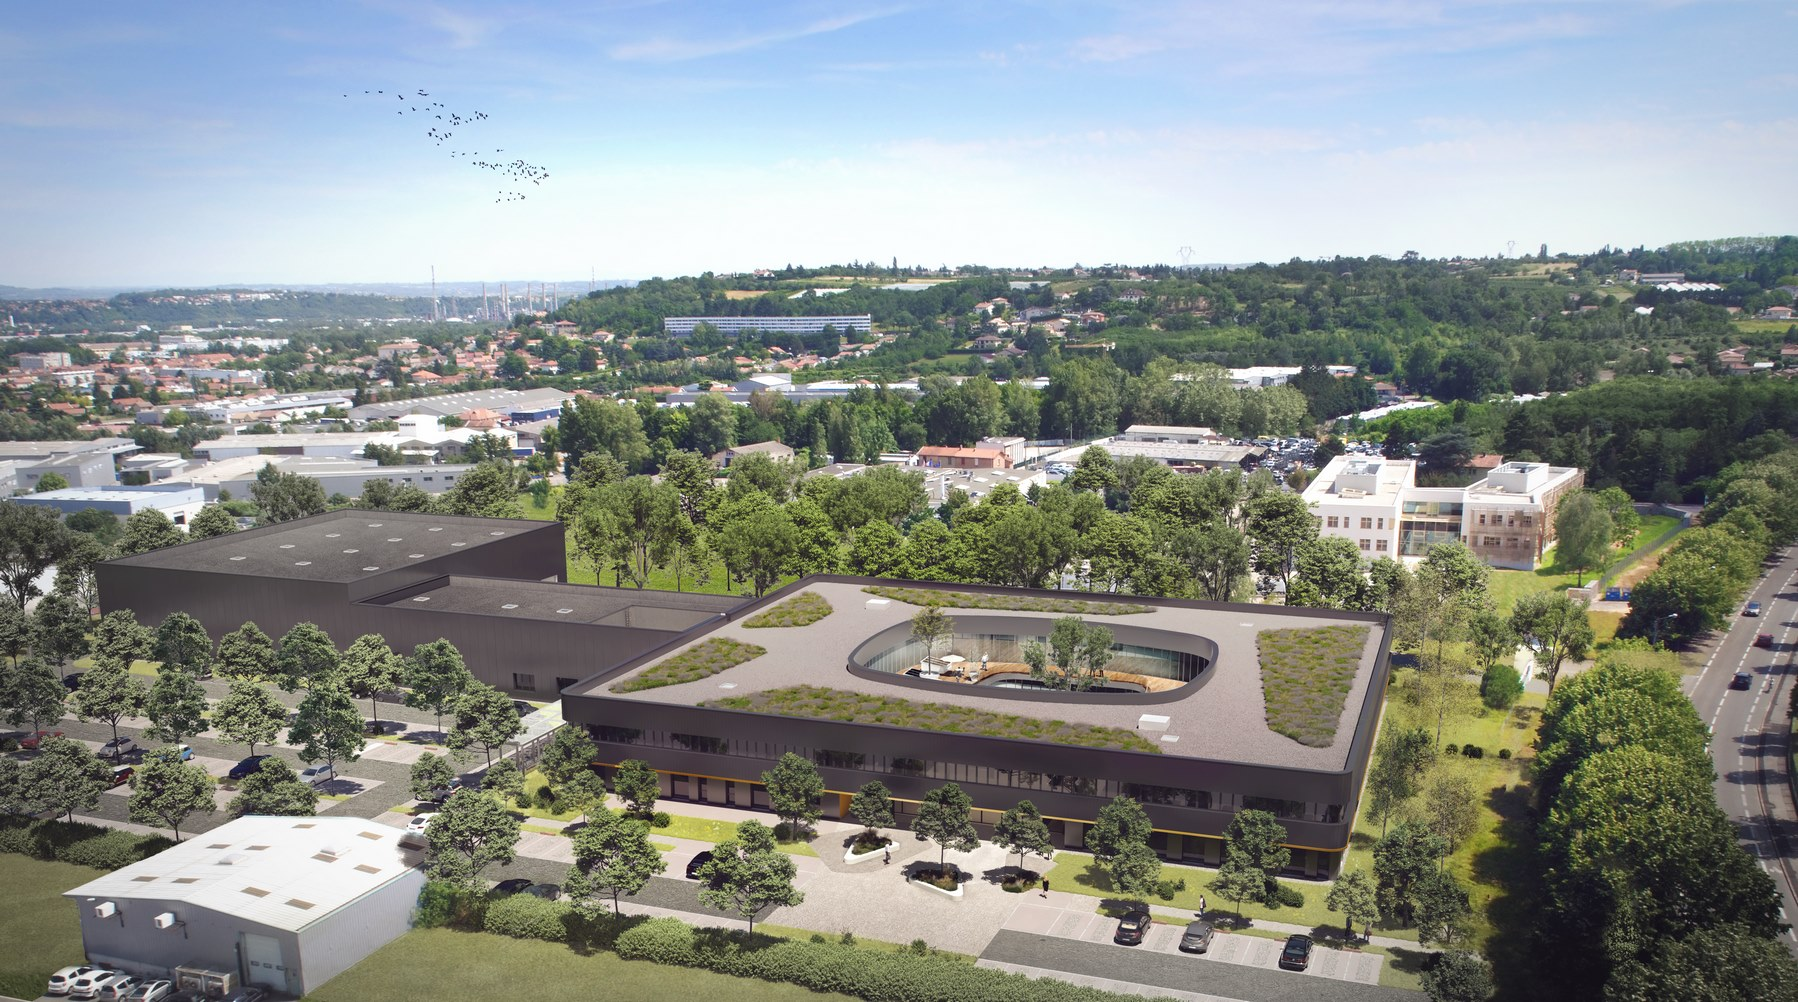 Siège mondial Tiama - Saint-Genis-Laval - Z Architecture